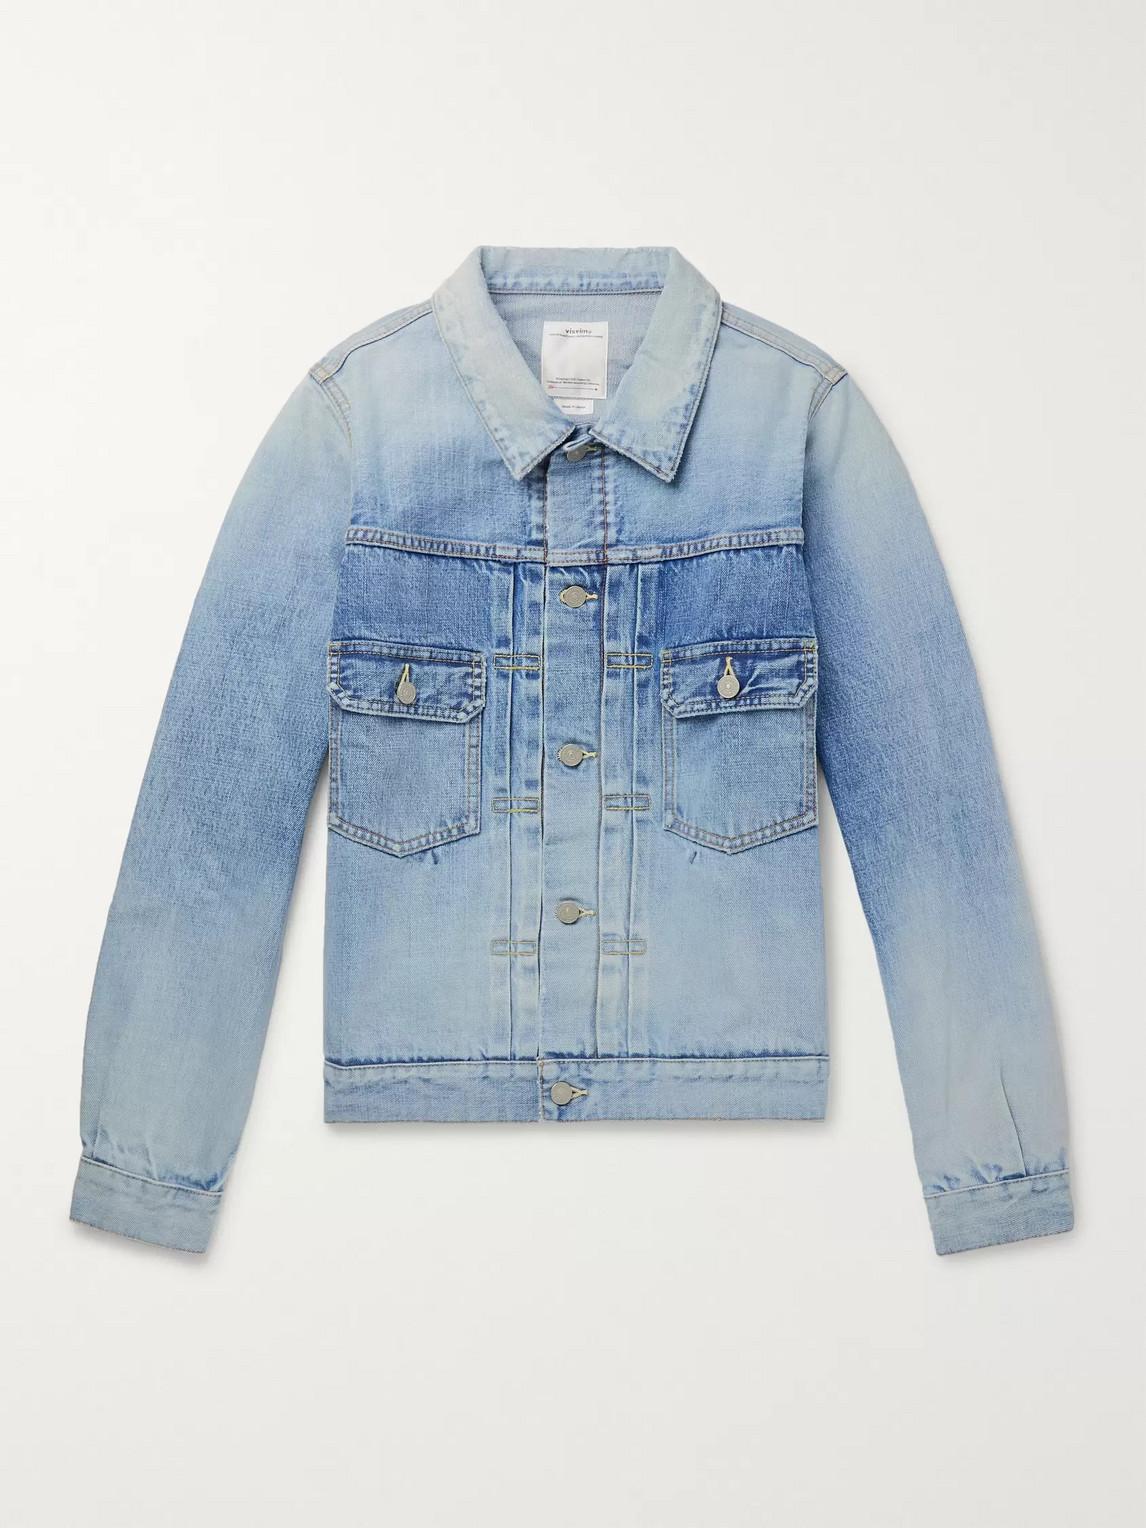 Visvim Social Sculpture 101 Distressed Denim Jacket In Blue